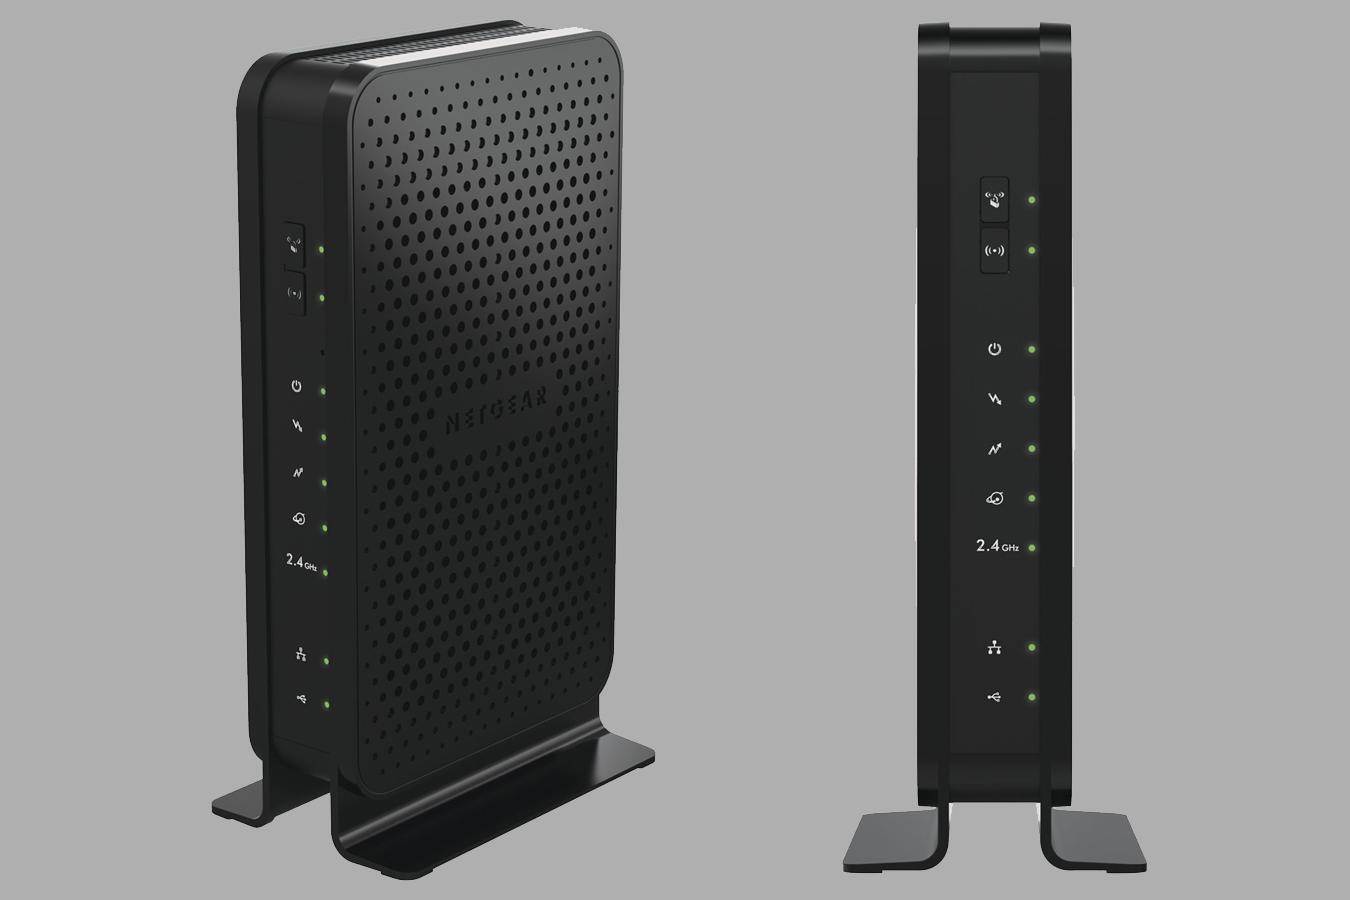 Netgear C3000 Cable Modem Router Deal 45 Certified